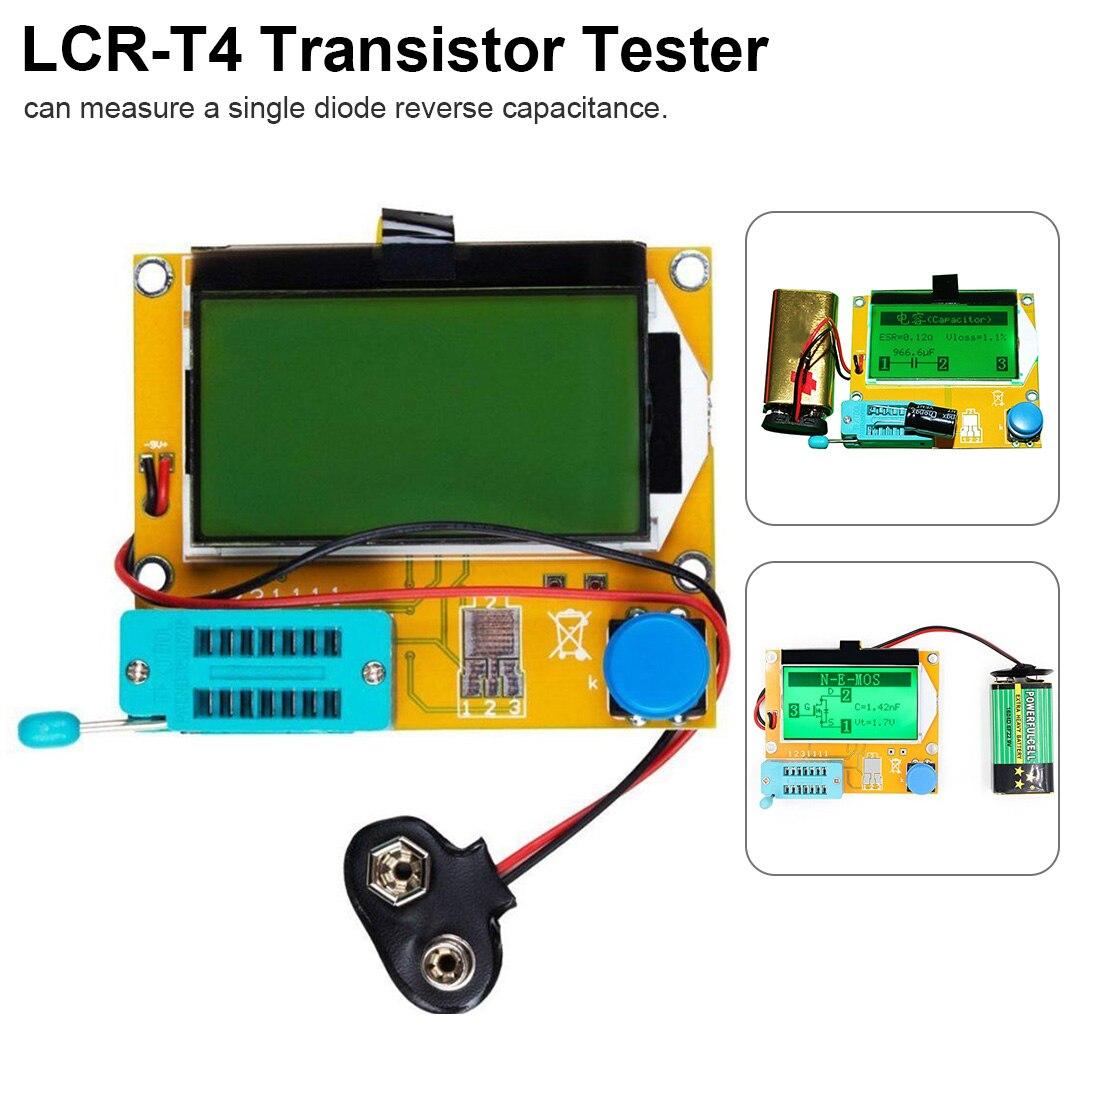 Medidor de esr transistor tester digital lcr mega328 v2.68 ESR-T4 diodo triode capacitância mos/pnp/npn lcr 12864 lcd tela tester